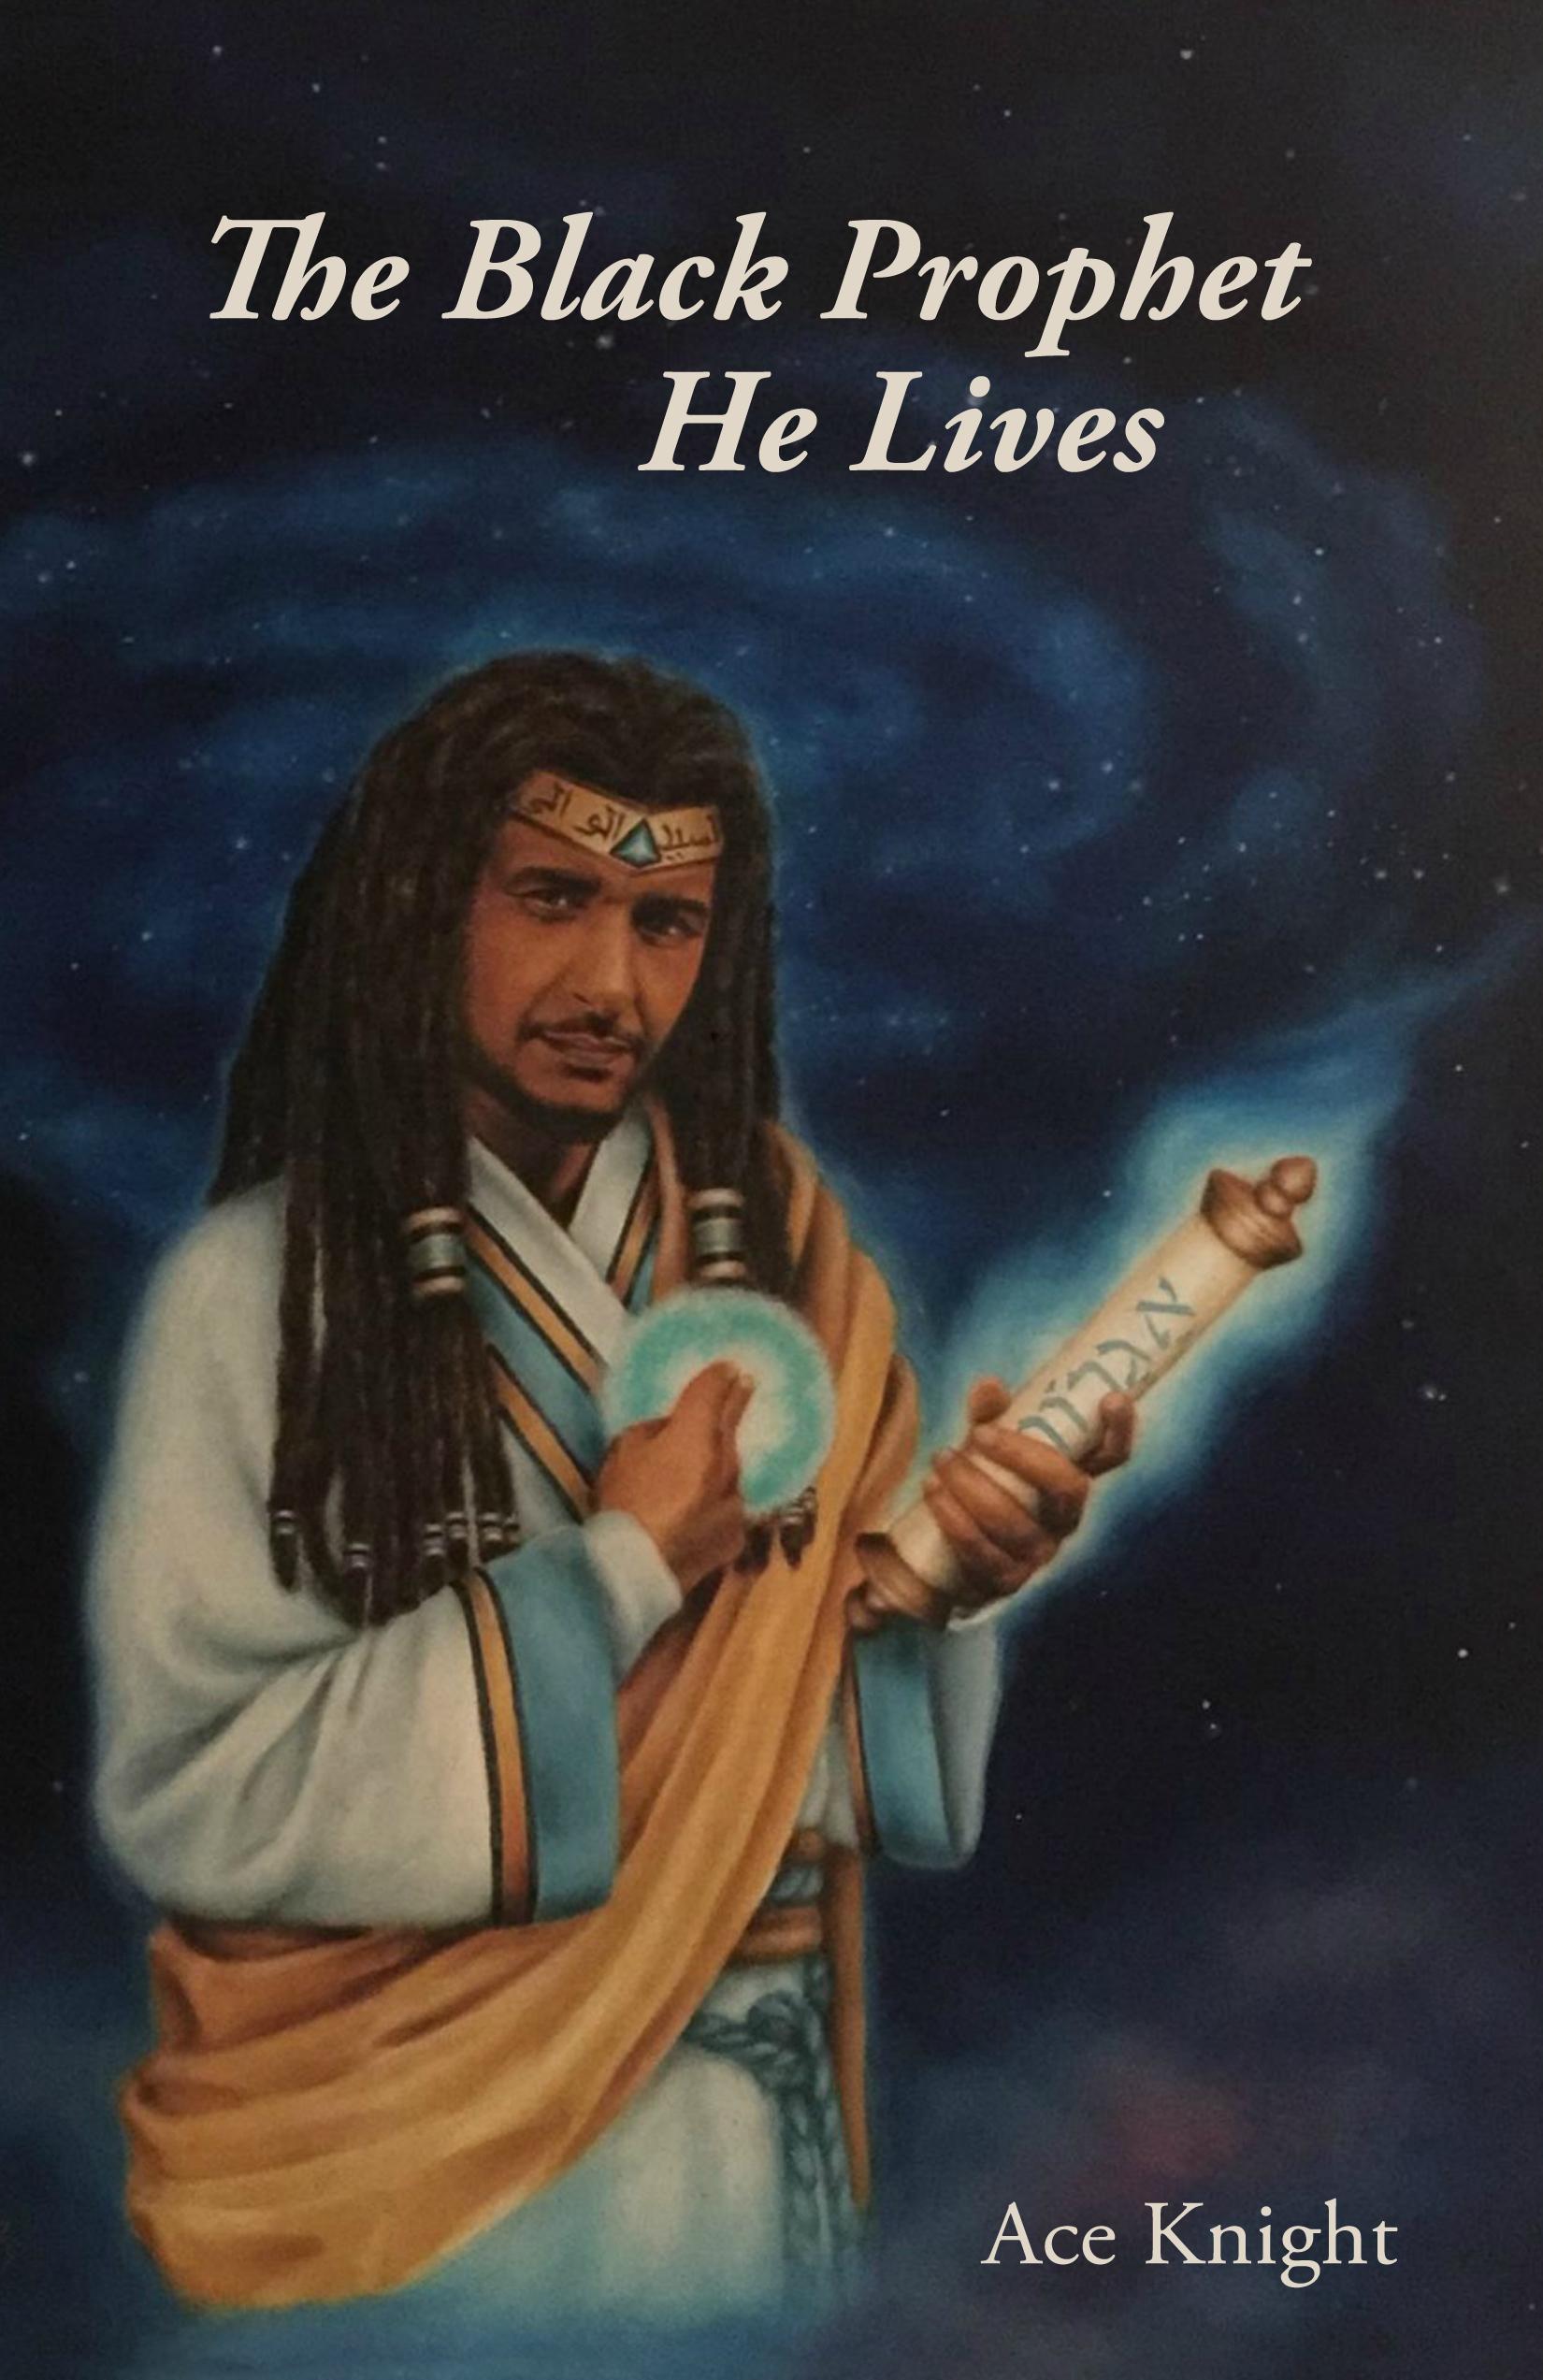 The Black Prophet He Lives